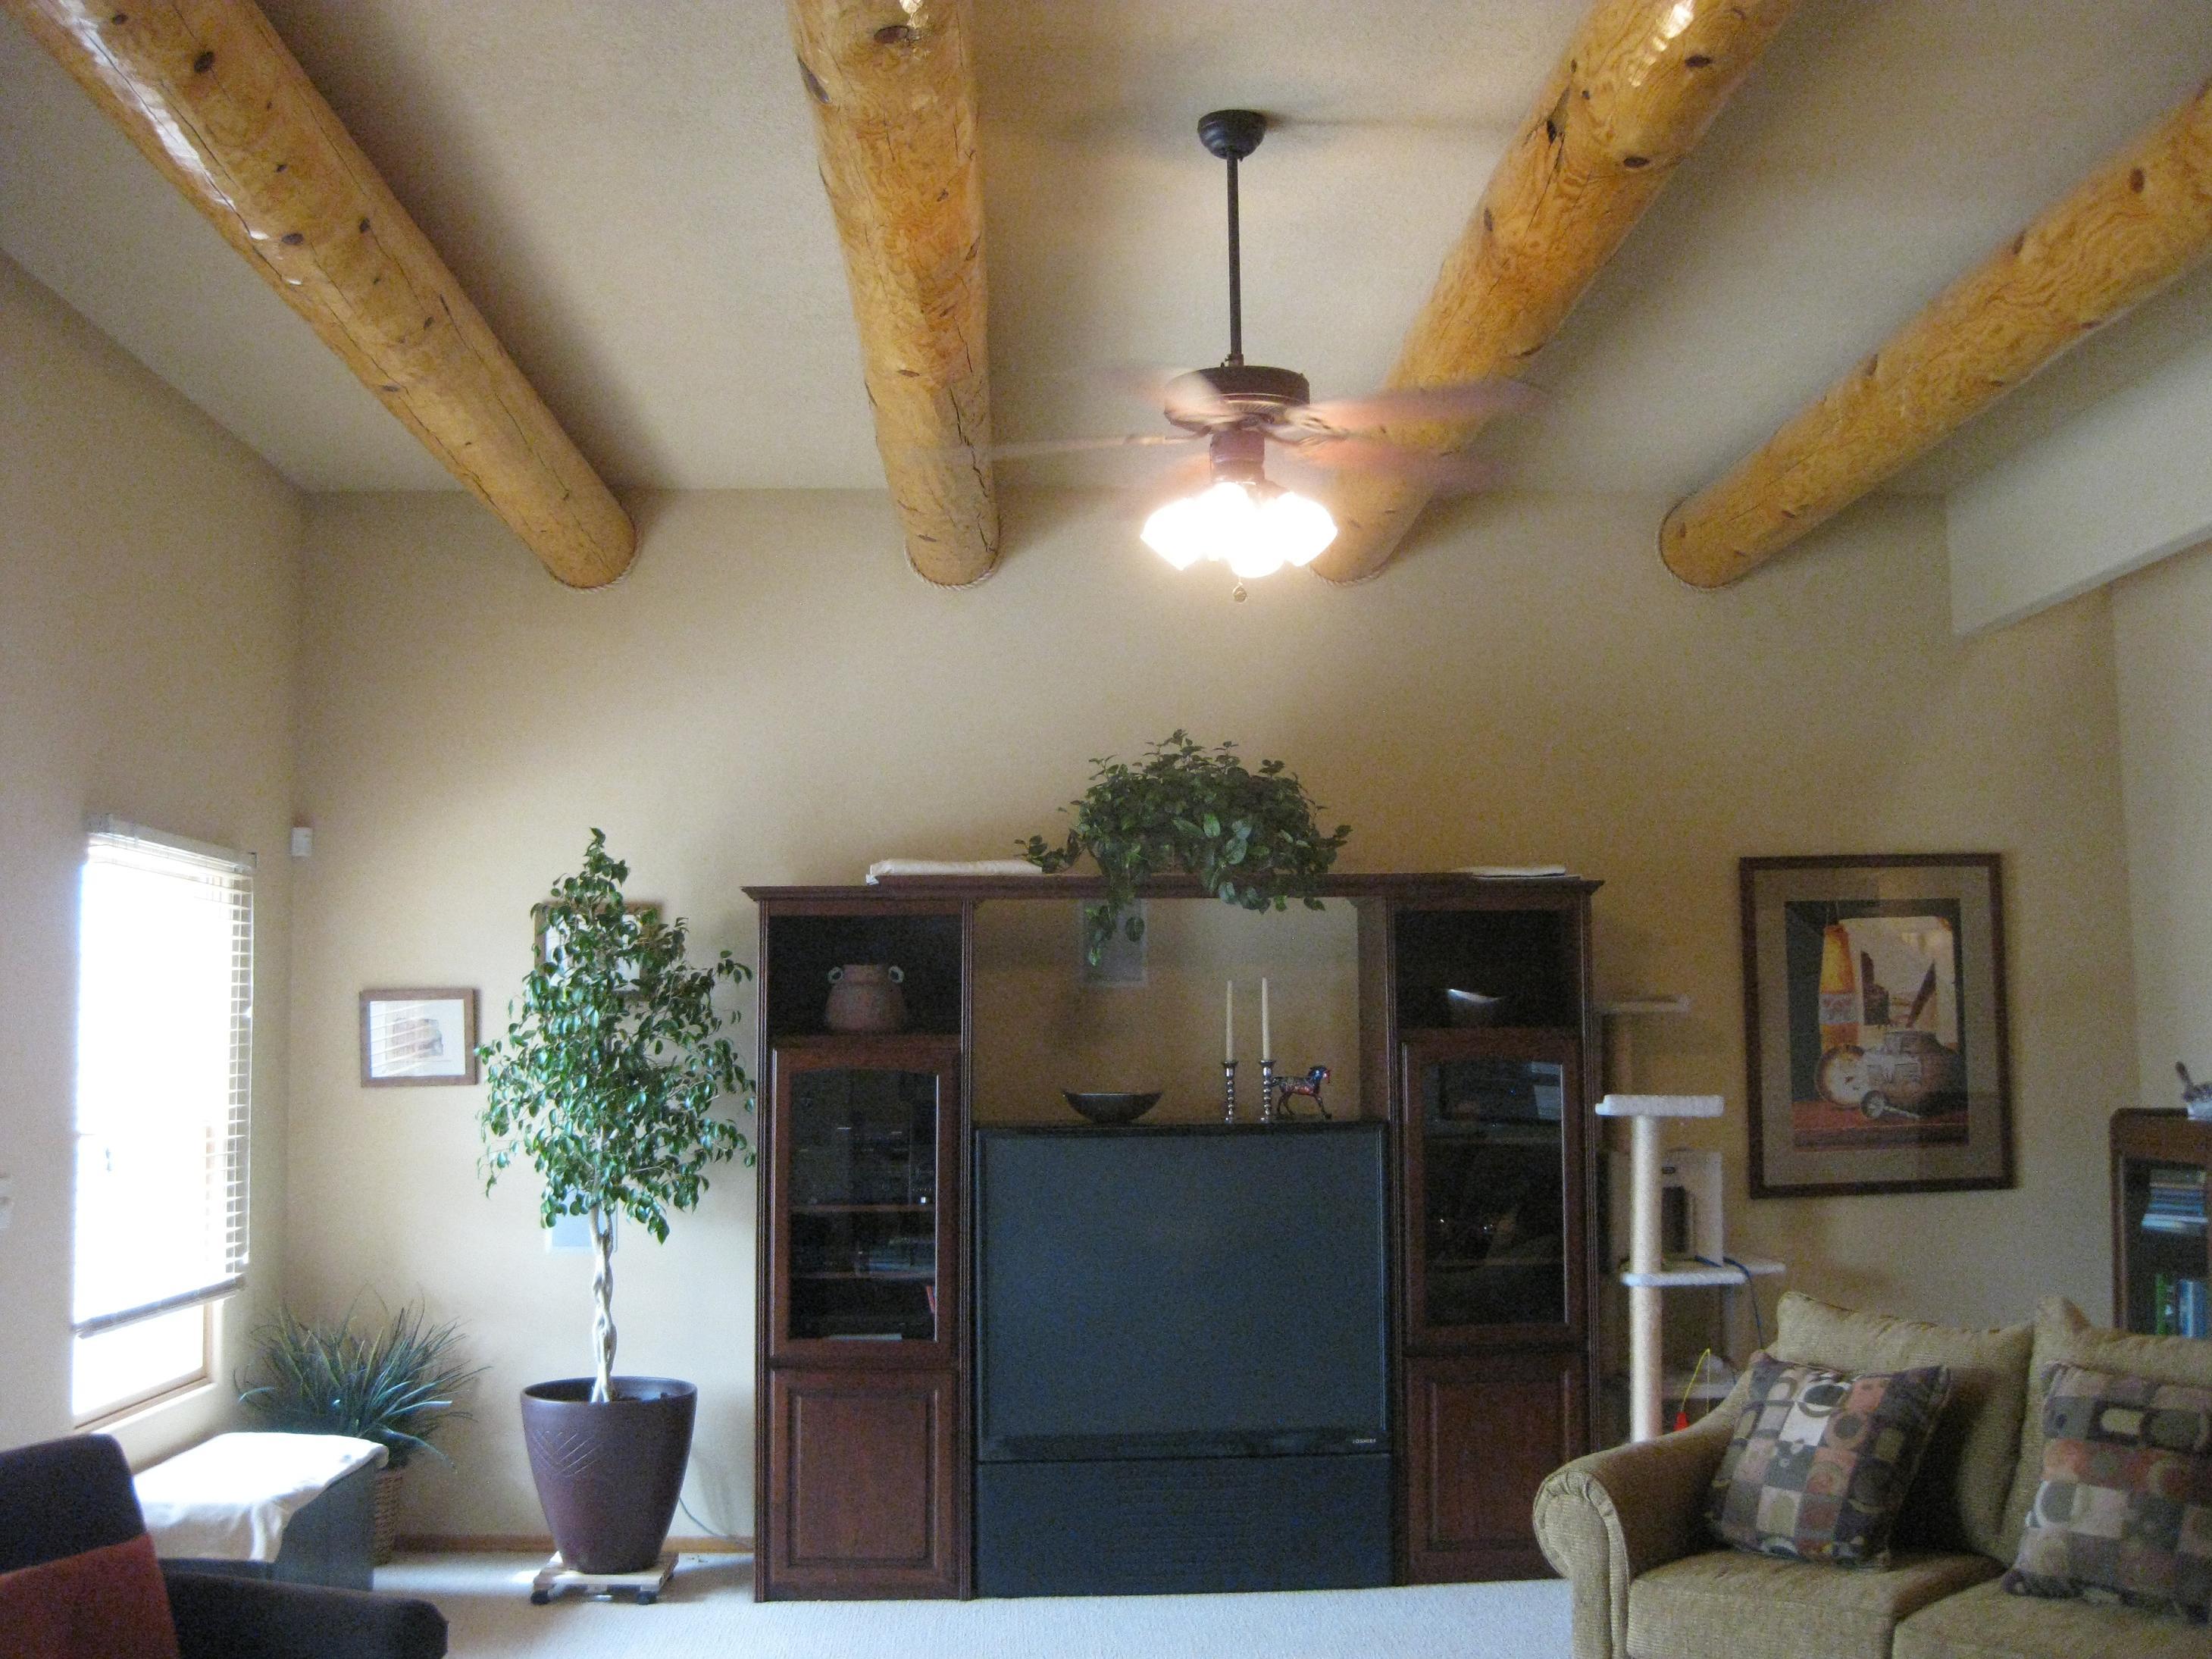 Rio Rancho Housing Market Average Home Prices Increase 9.23